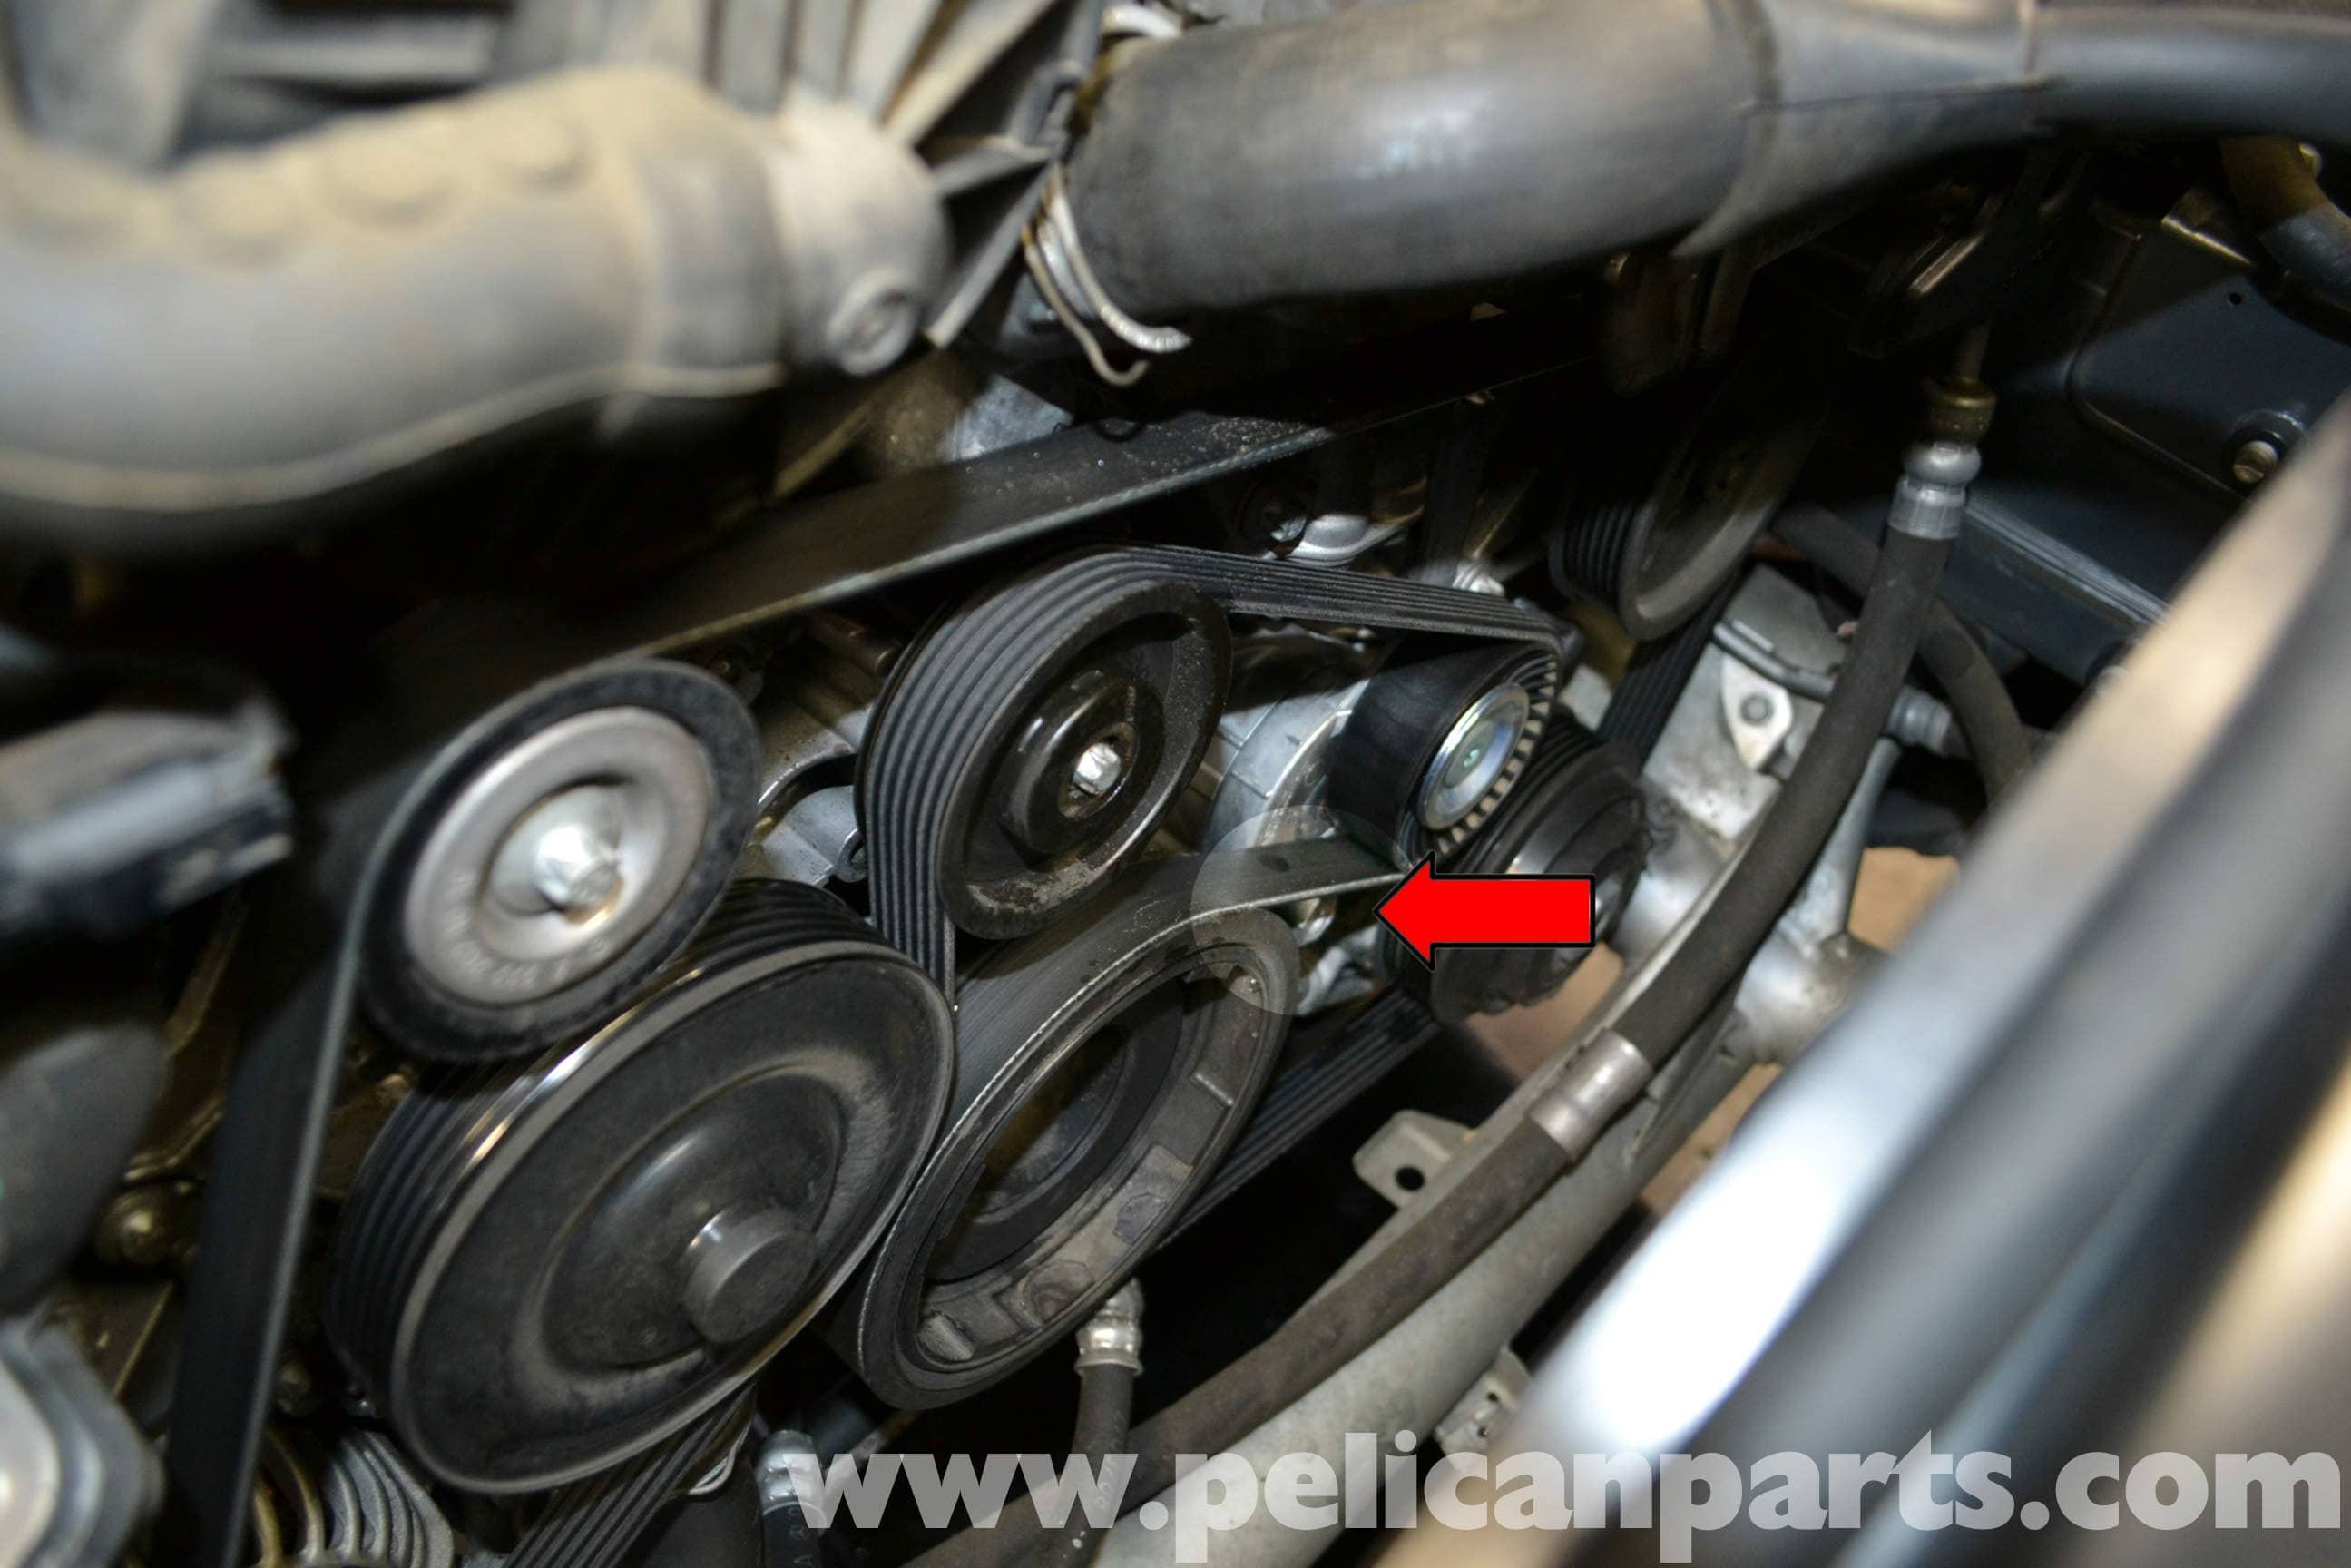 Mercedes-Benz W204 Drive Belt Replacement - (2008-2014) C250